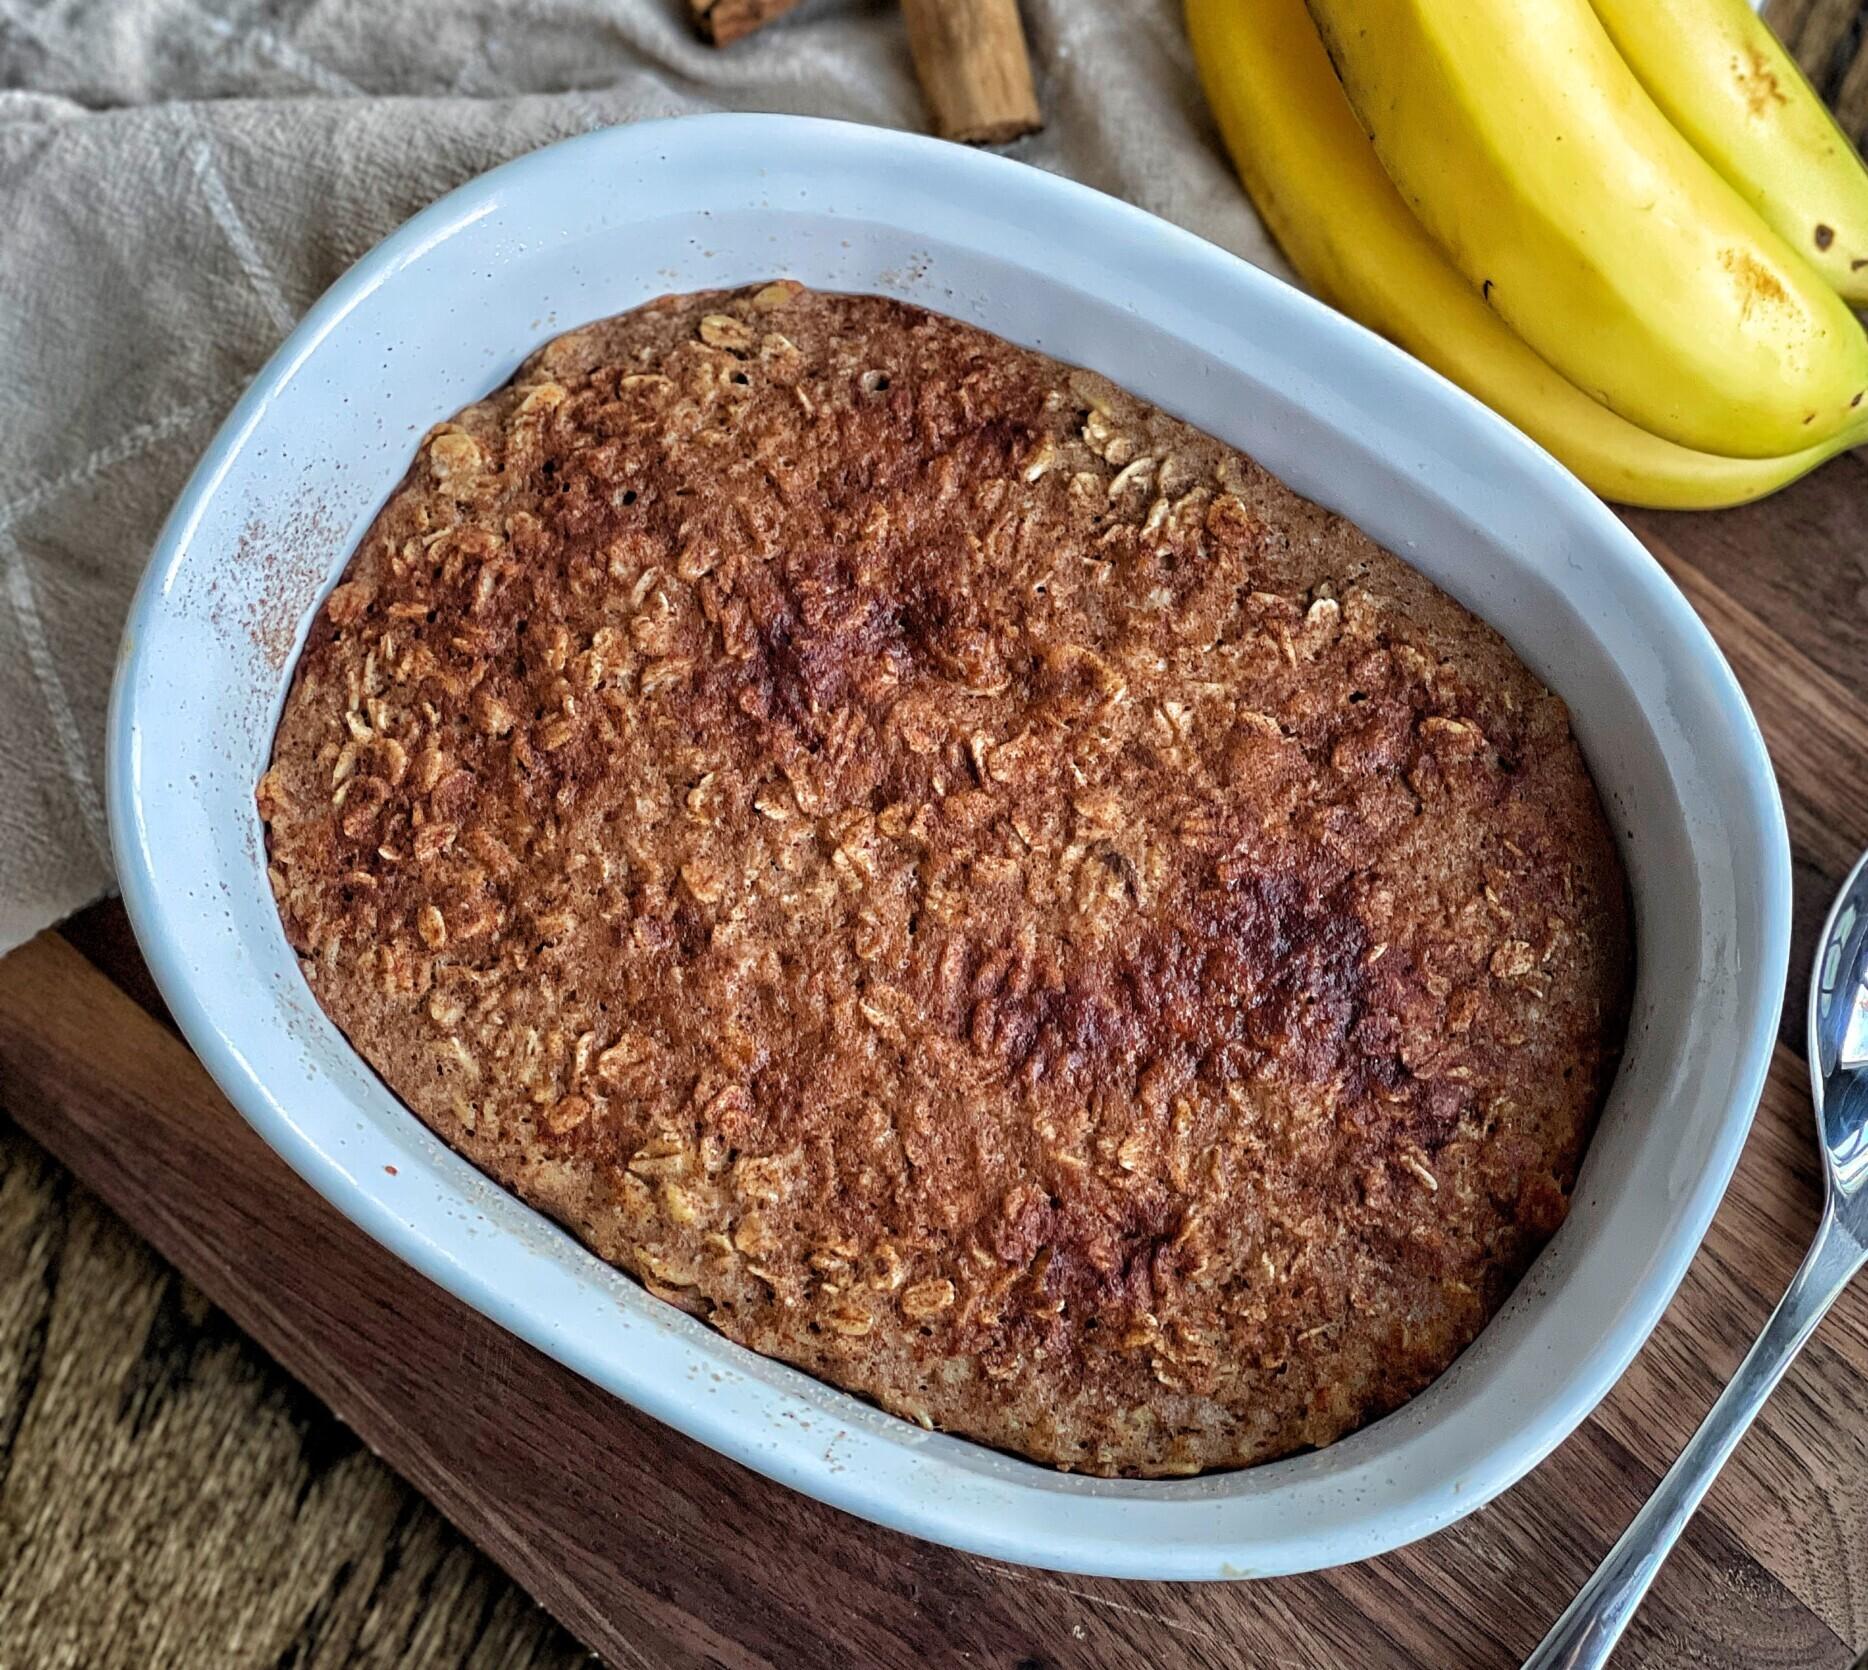 maple cinnamon baked oatmeal